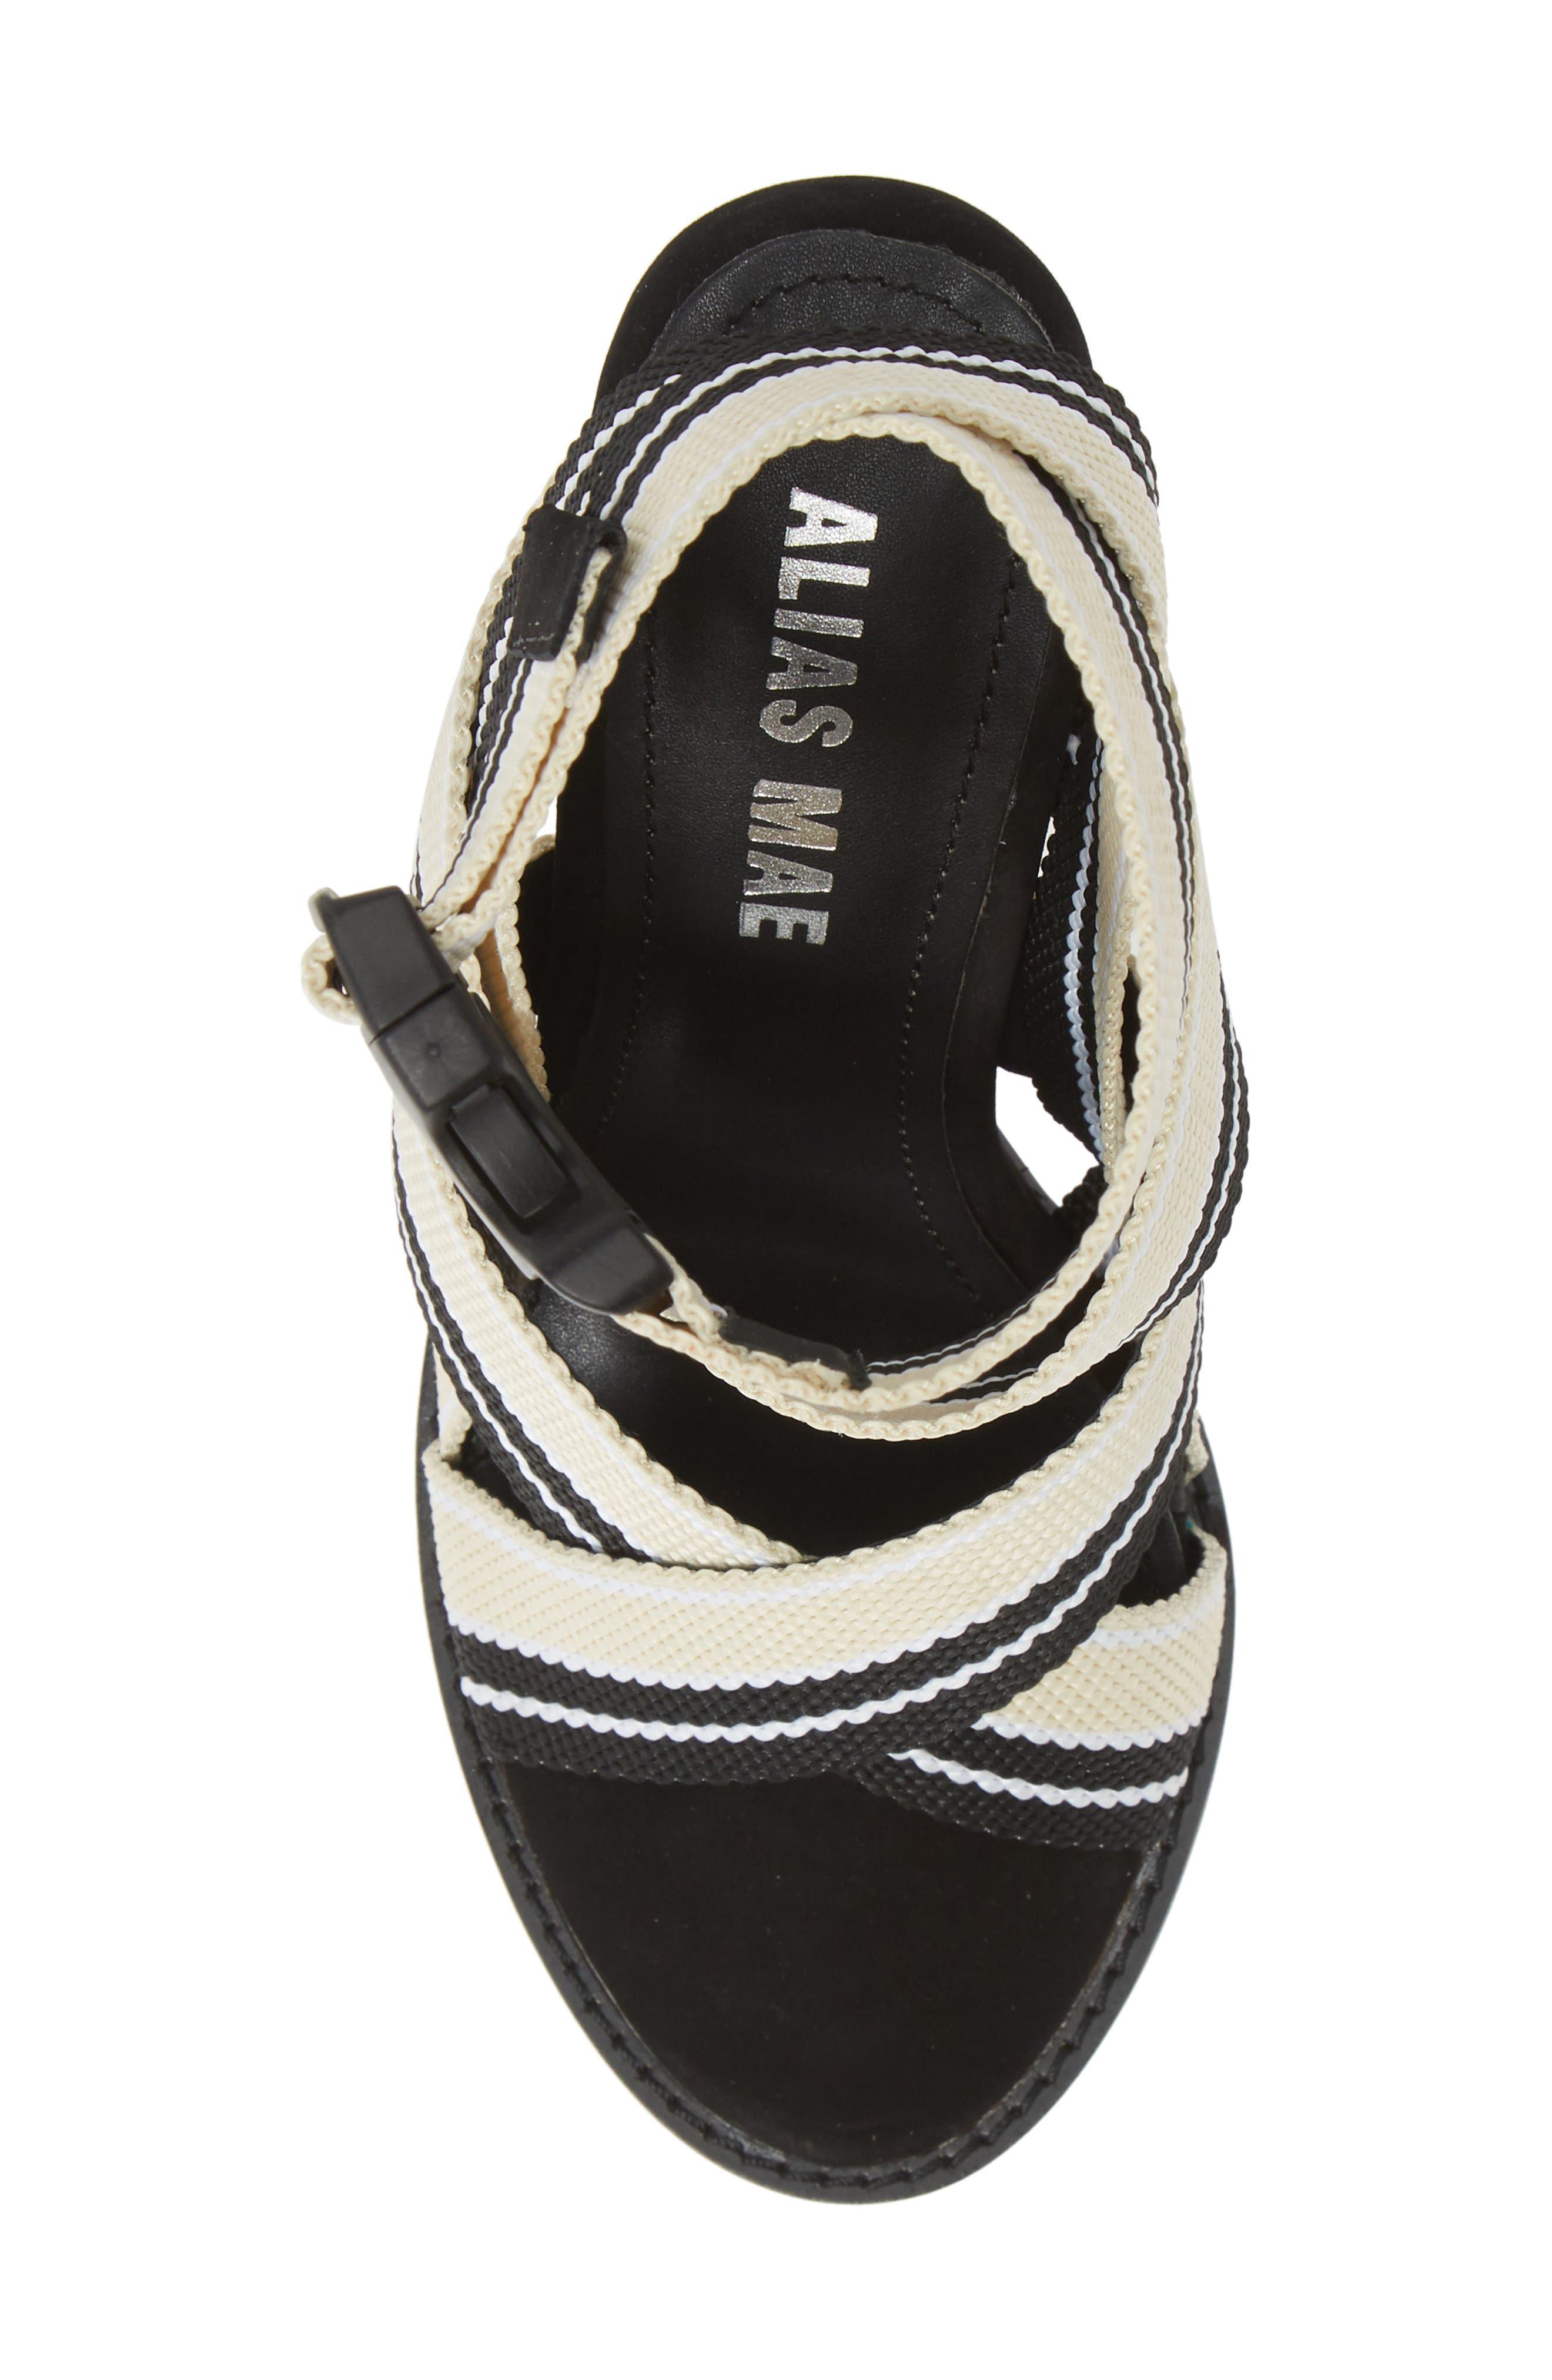 ALIAS MAE, Woven Strappy Sandal, Alternate thumbnail 5, color, NUDE/ BLACK FABRIC